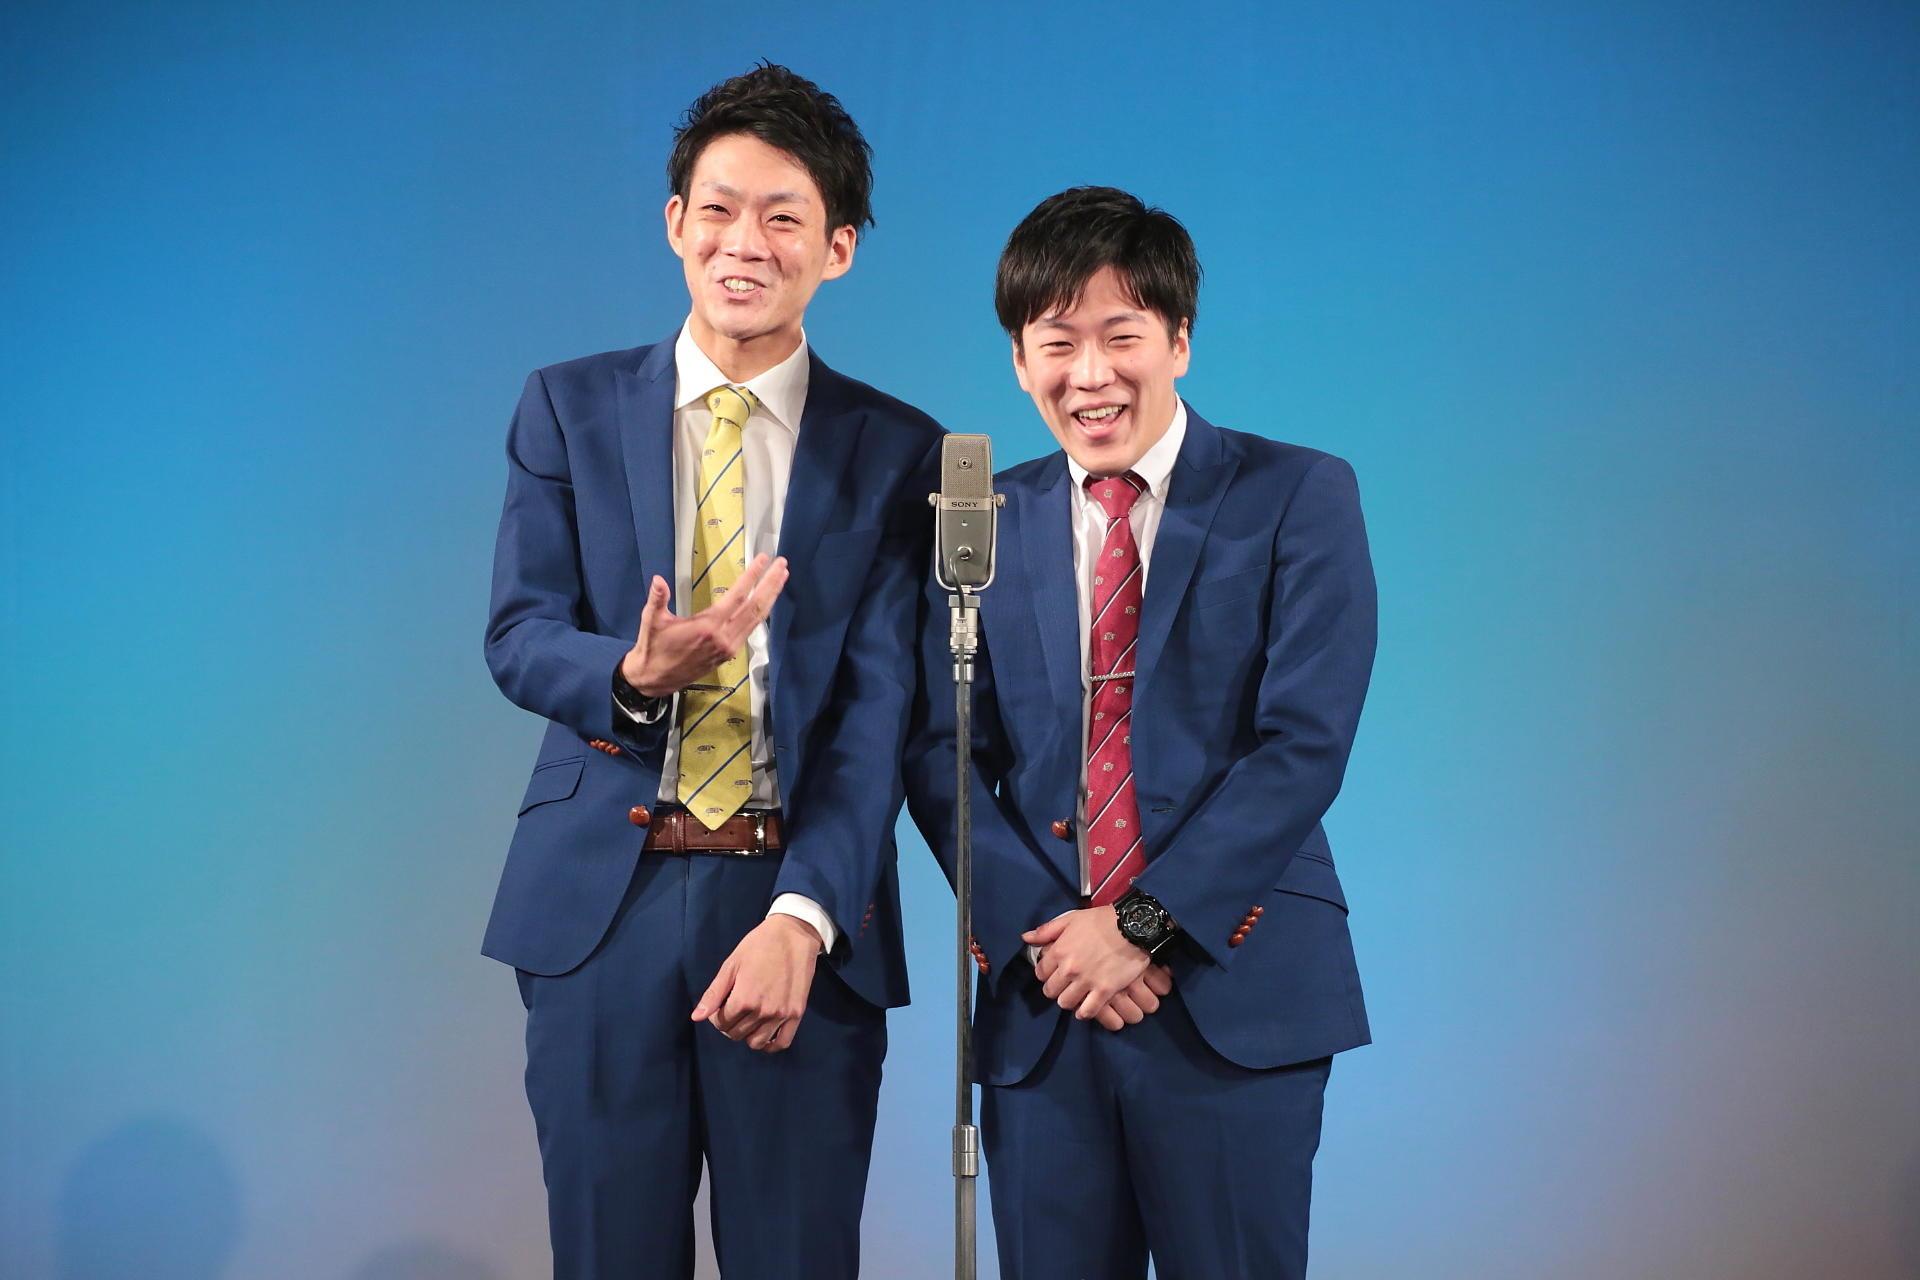 http://news.yoshimoto.co.jp/20171223170732-4f93f127956e7d2011513313689efa6f4c5a6c07.jpg